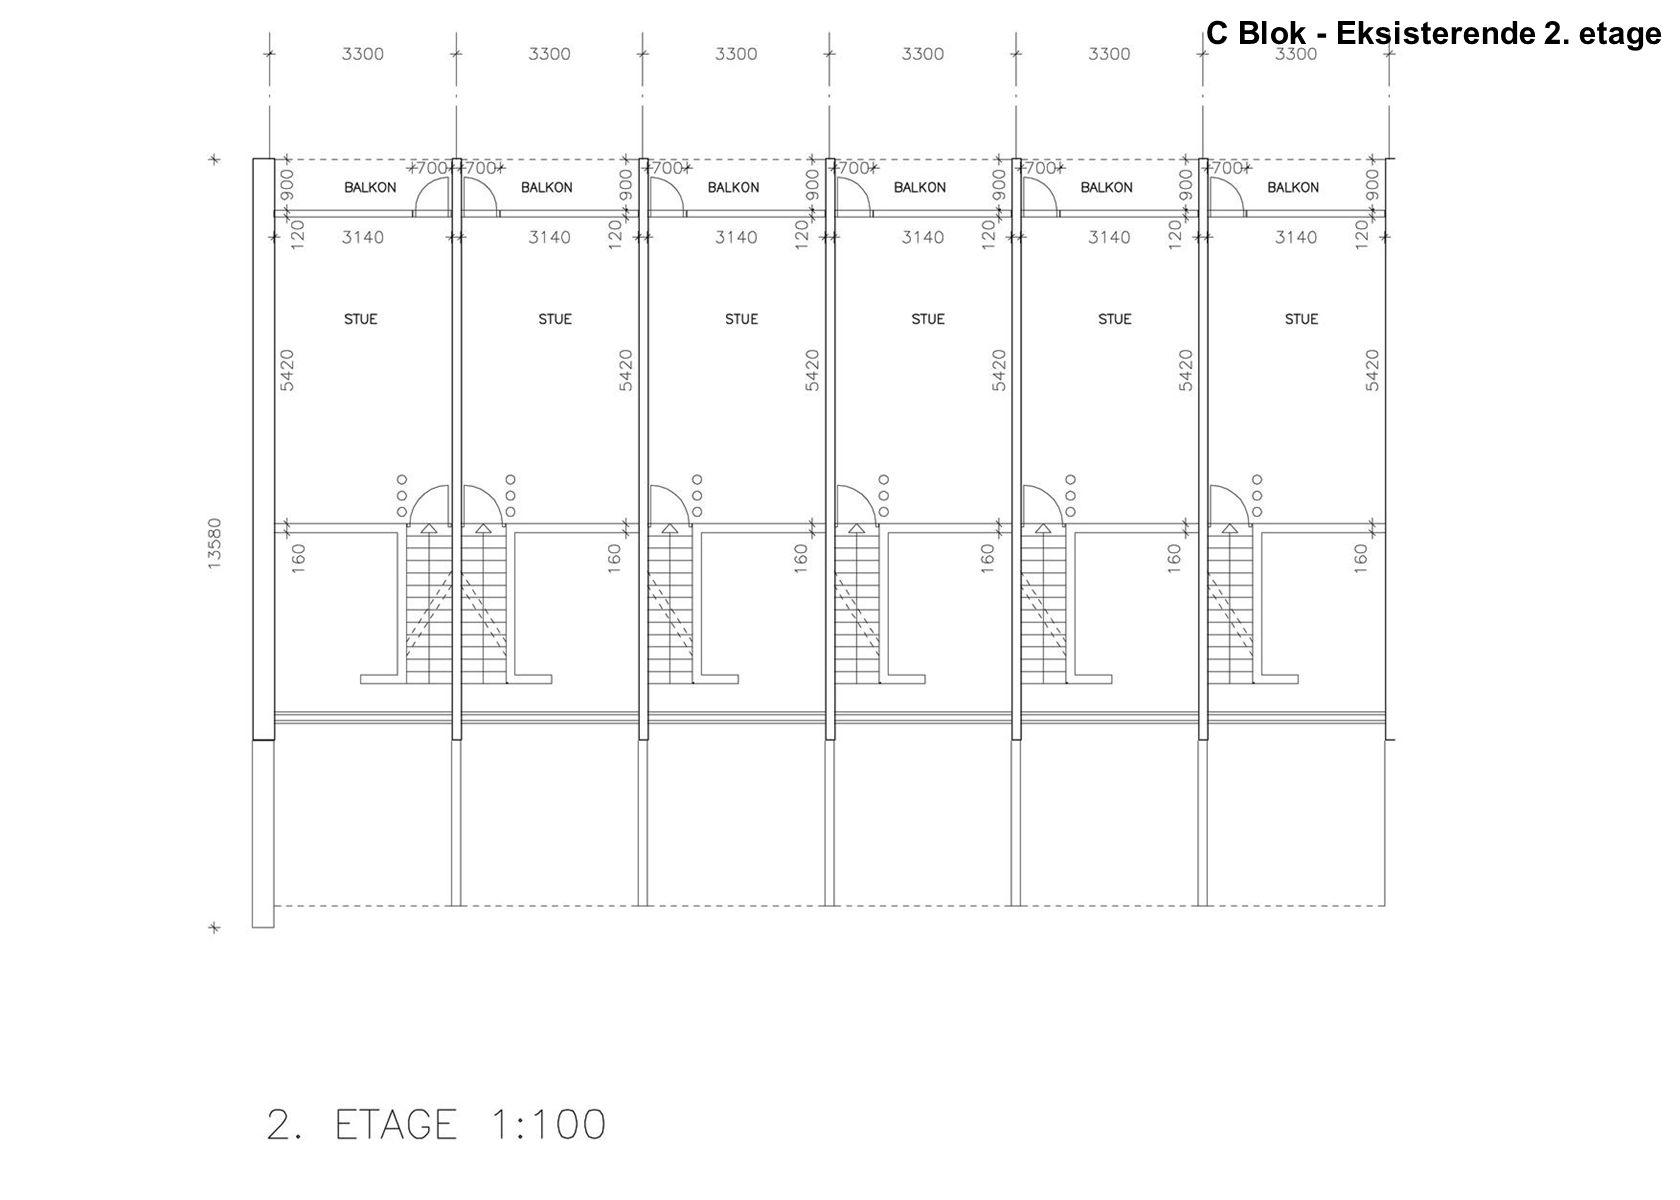 C Blok - Eksisterende 2. etage